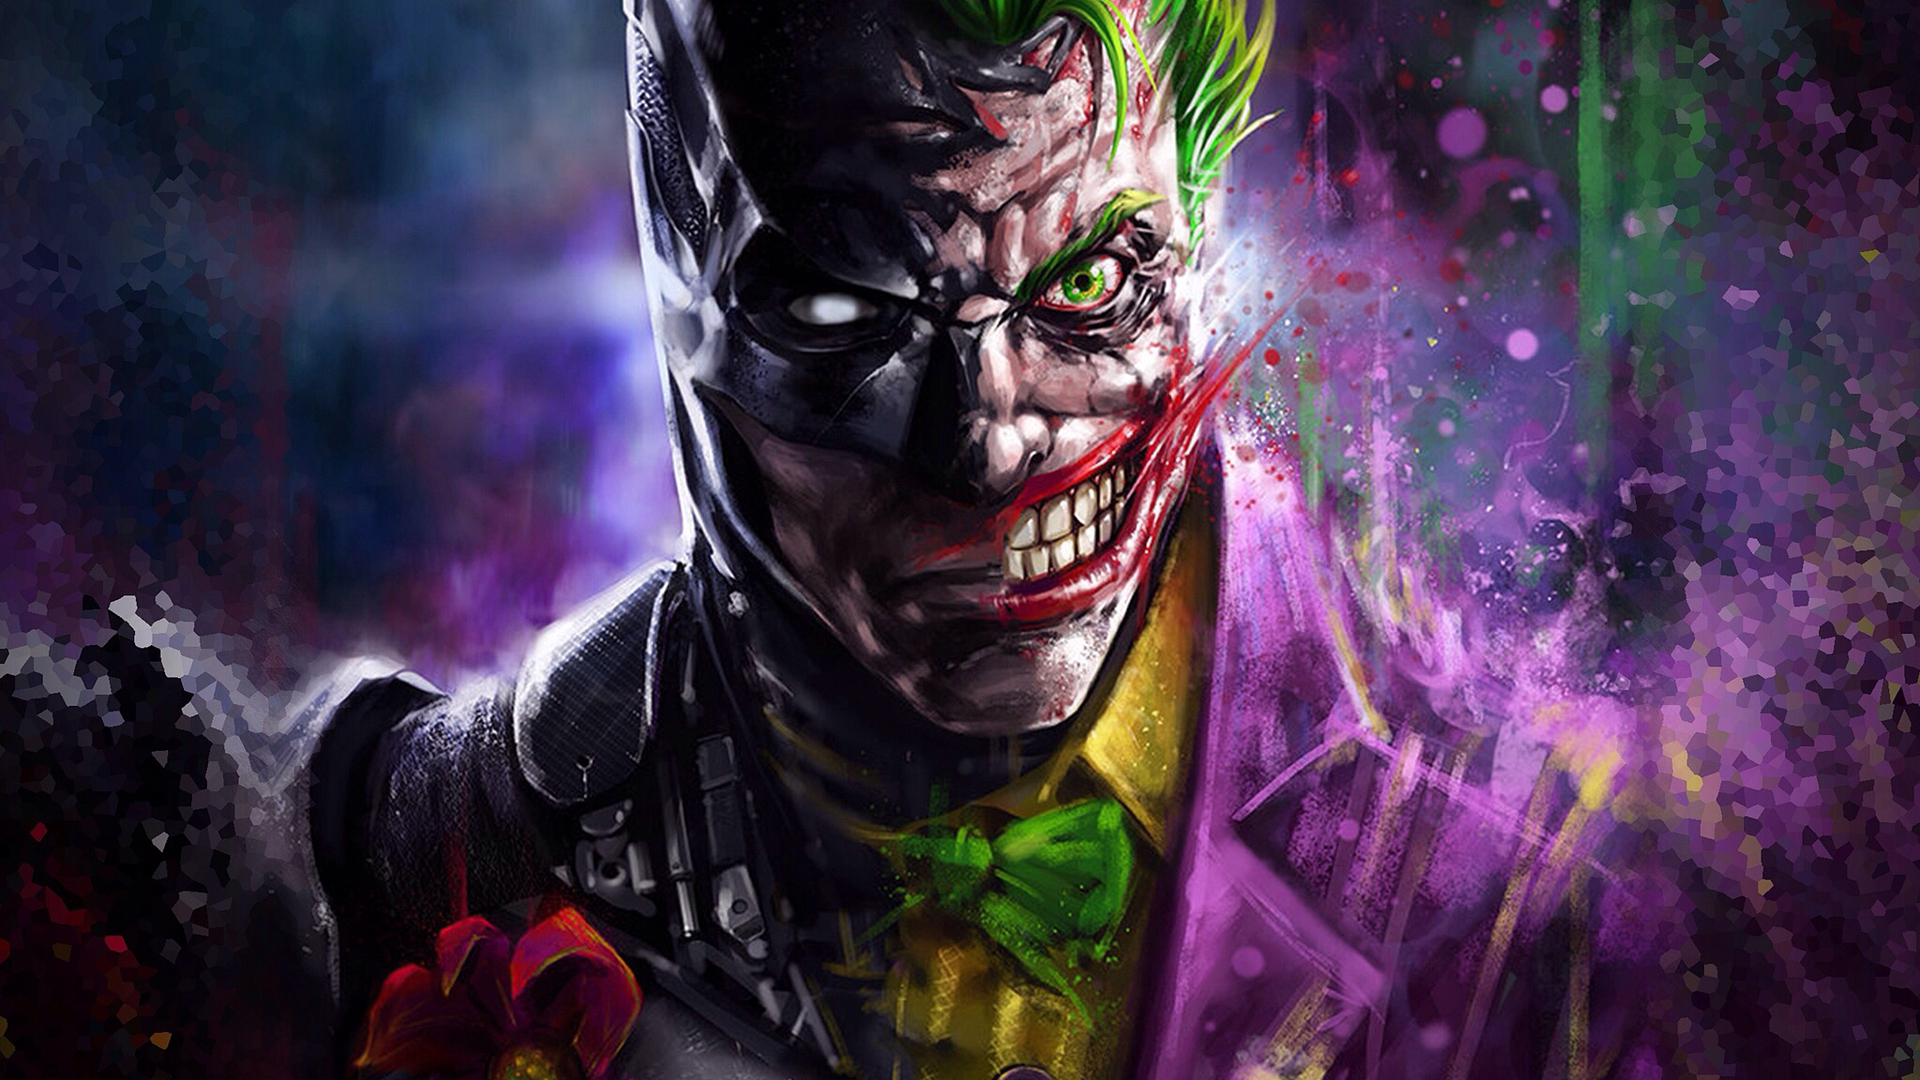 1920x1080 Batman Joker Art Laptop Full Hd 1080p Hd 4k Wallpapers